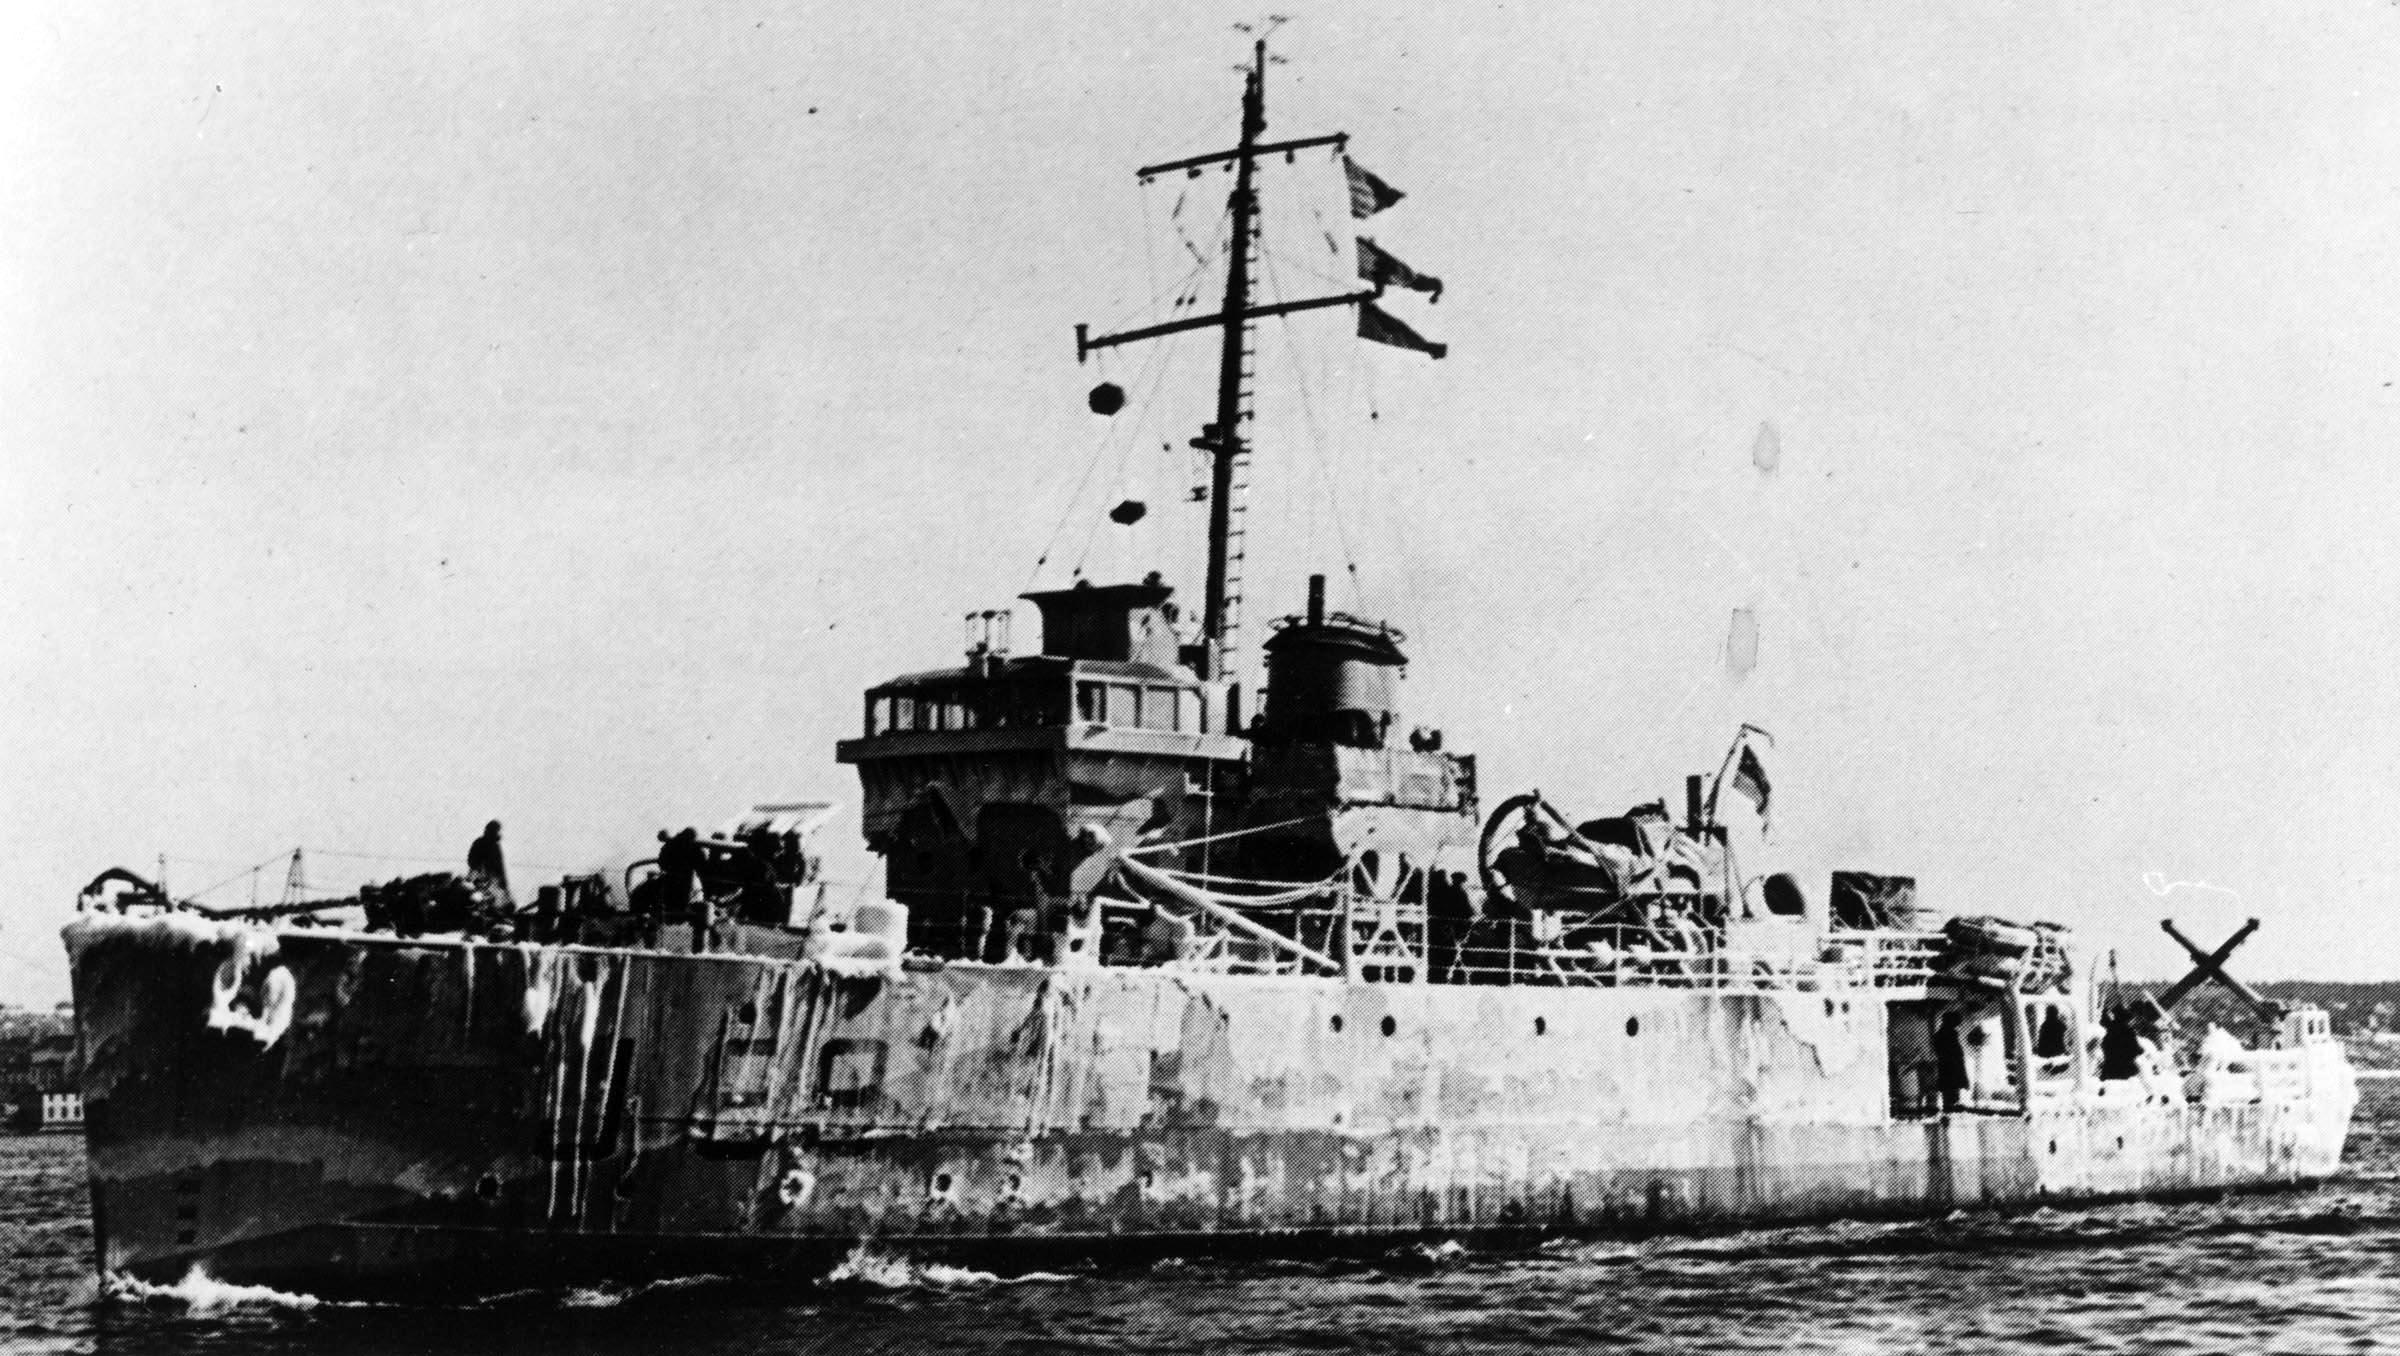 HMCS INGONISH